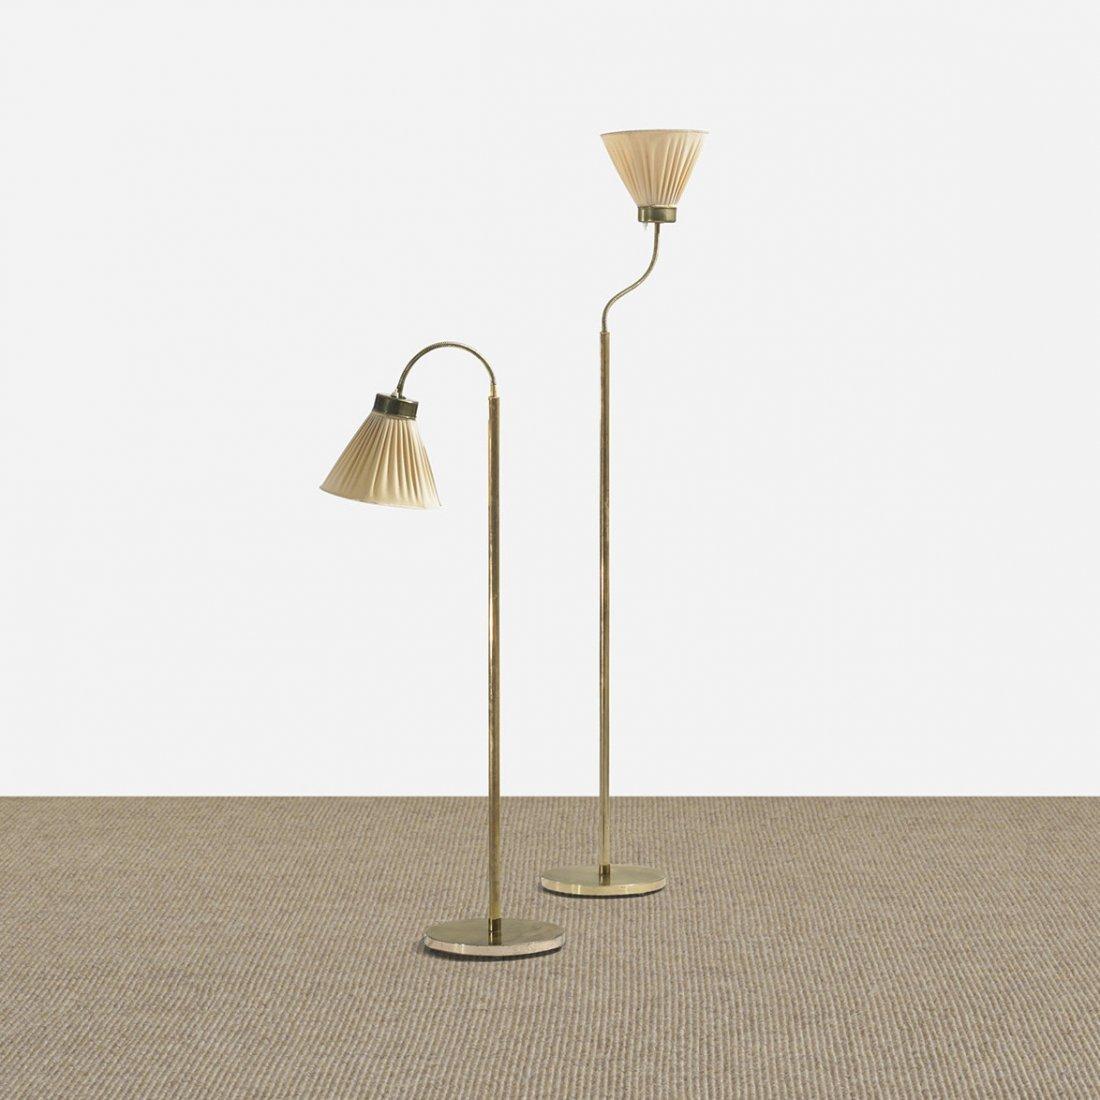 123: Josef Frank floor lamps model 1838, pair